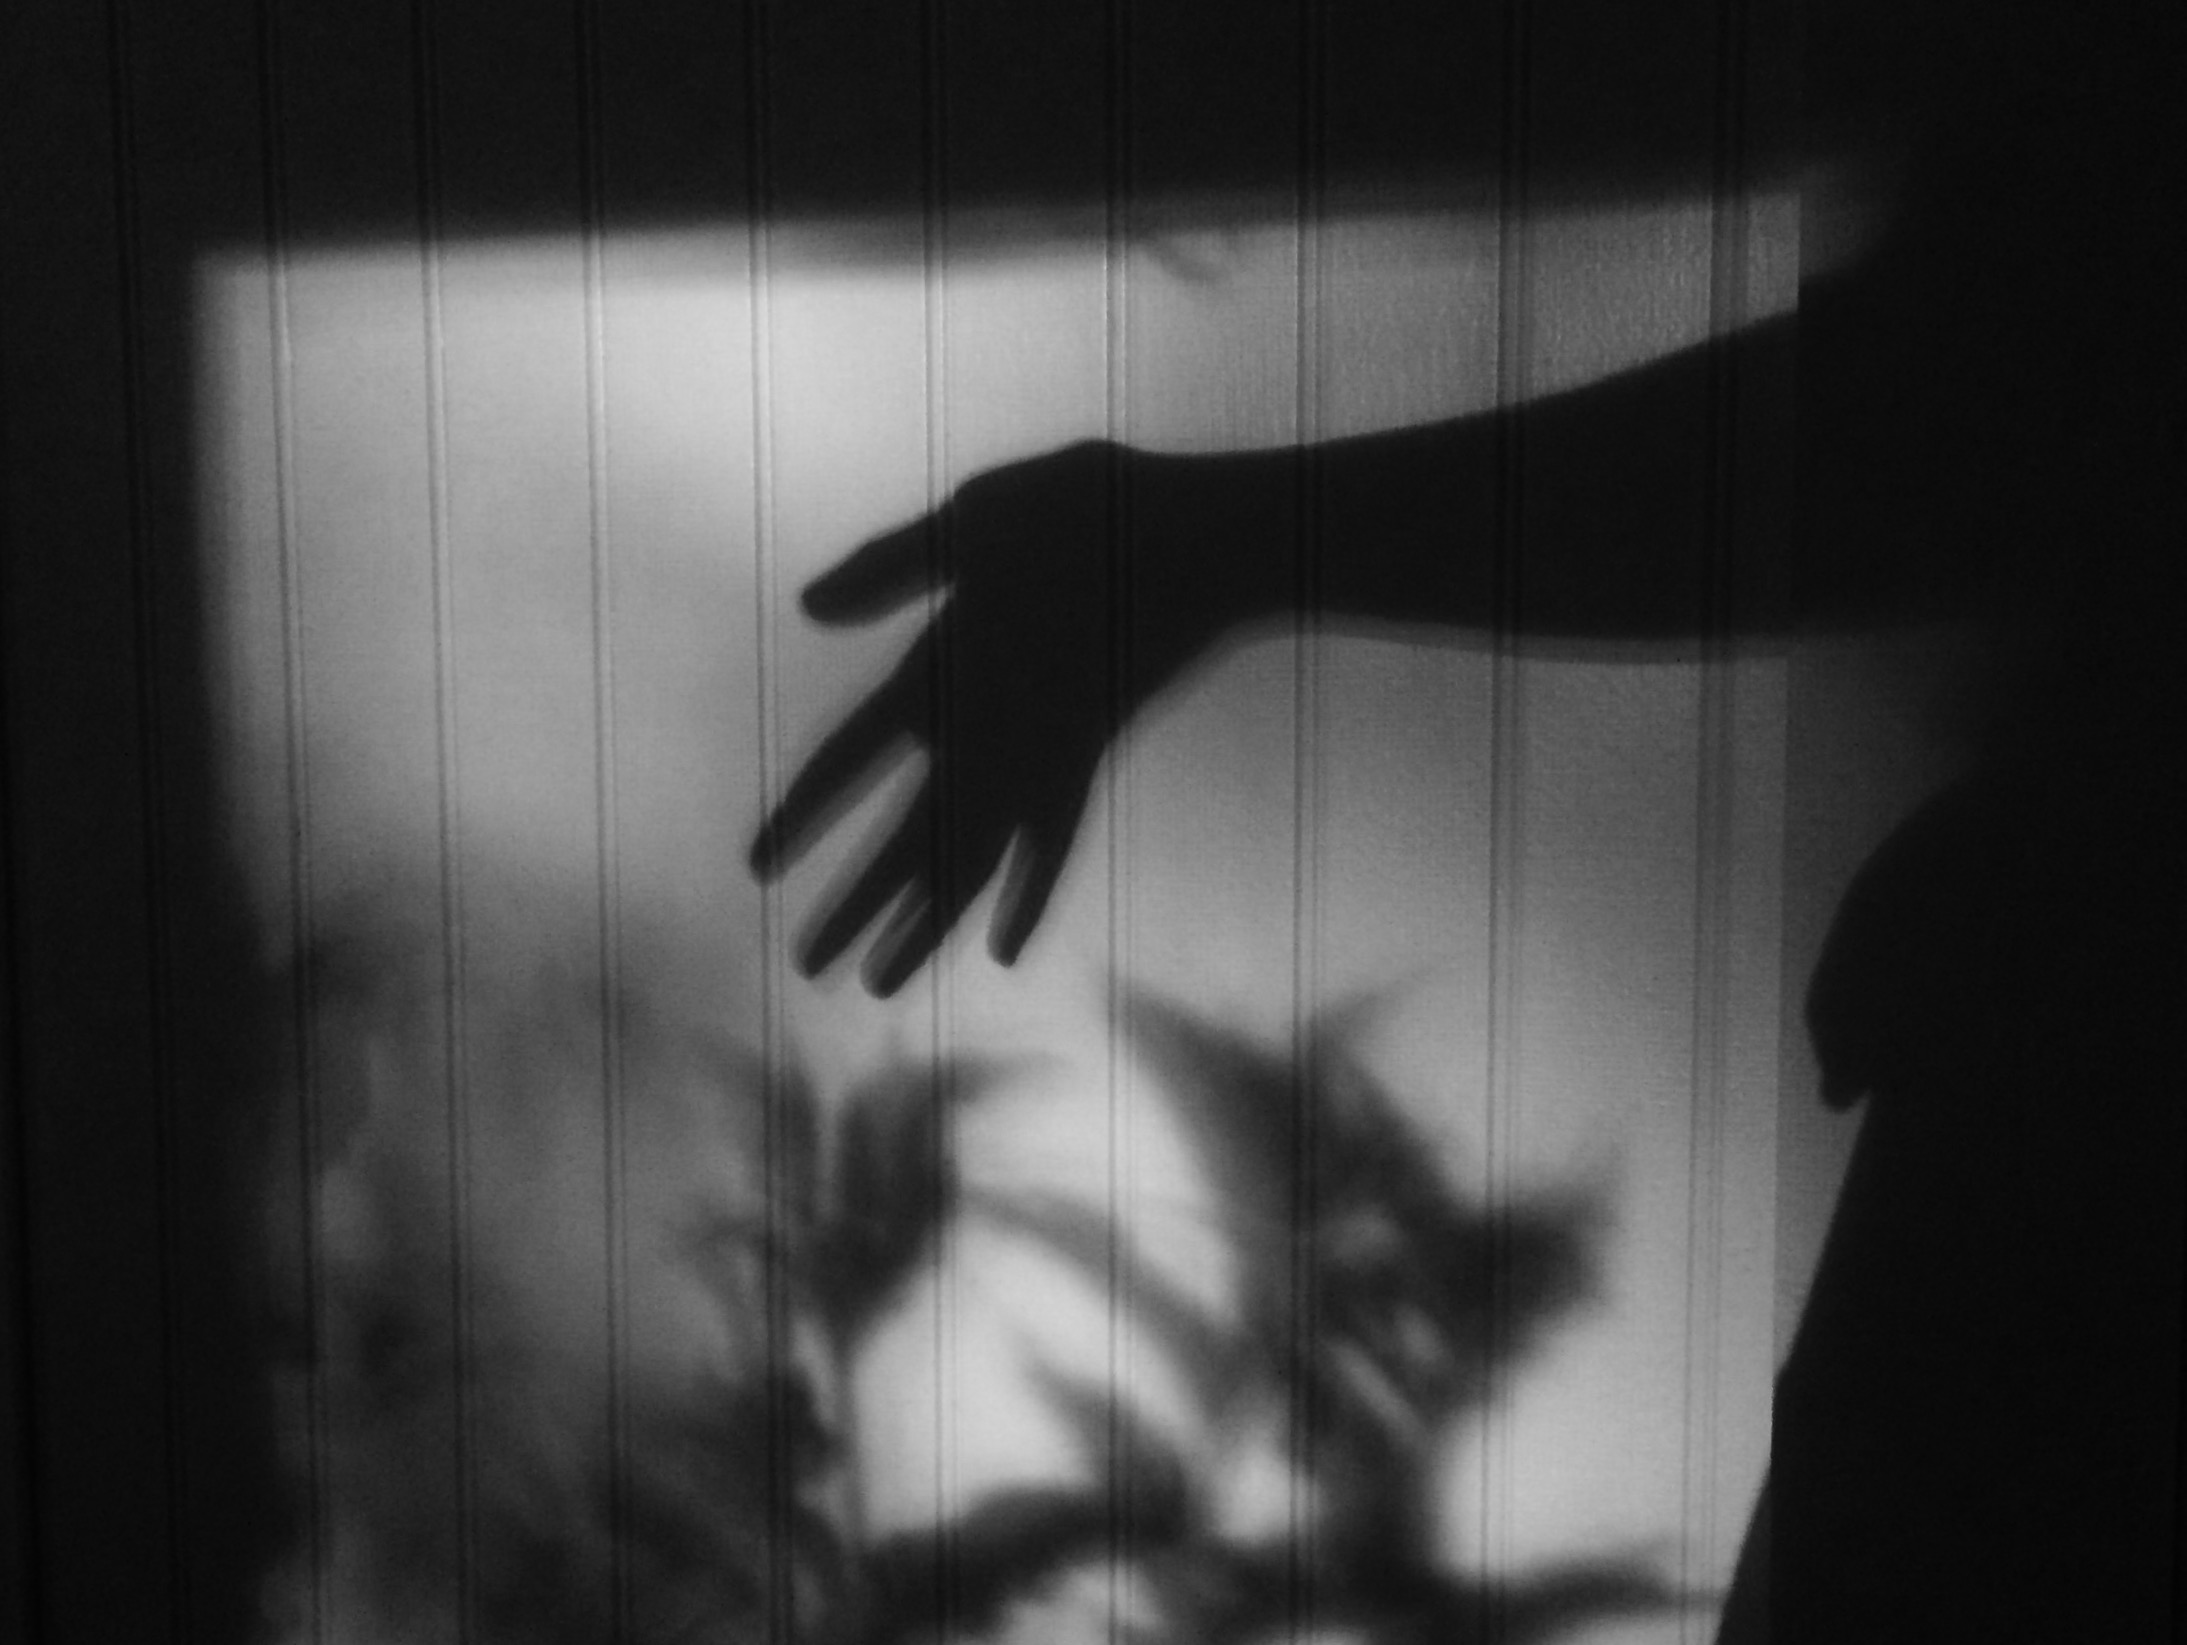 shadowhand.jpg